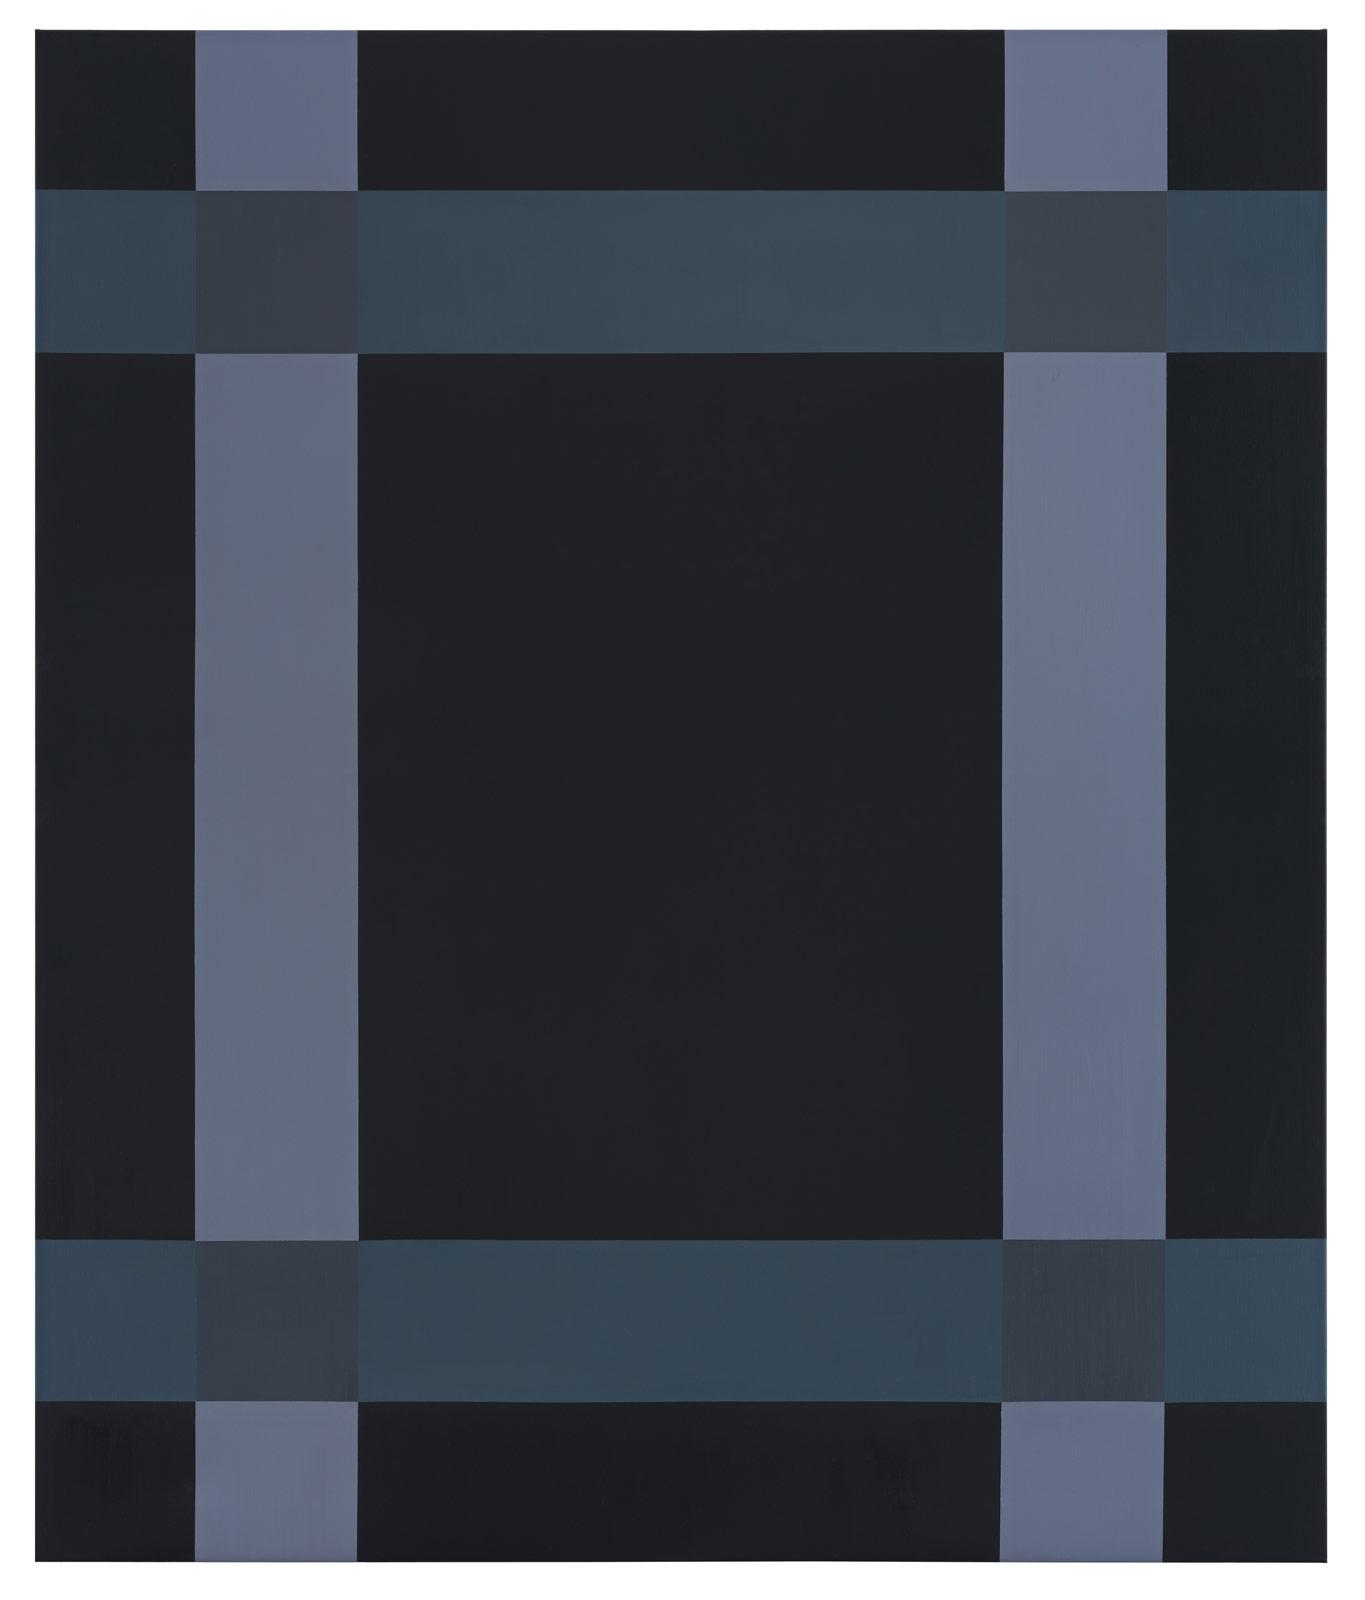 Den nattlige, 2018. Oil on canvas, 190 x 160 x 3 cm